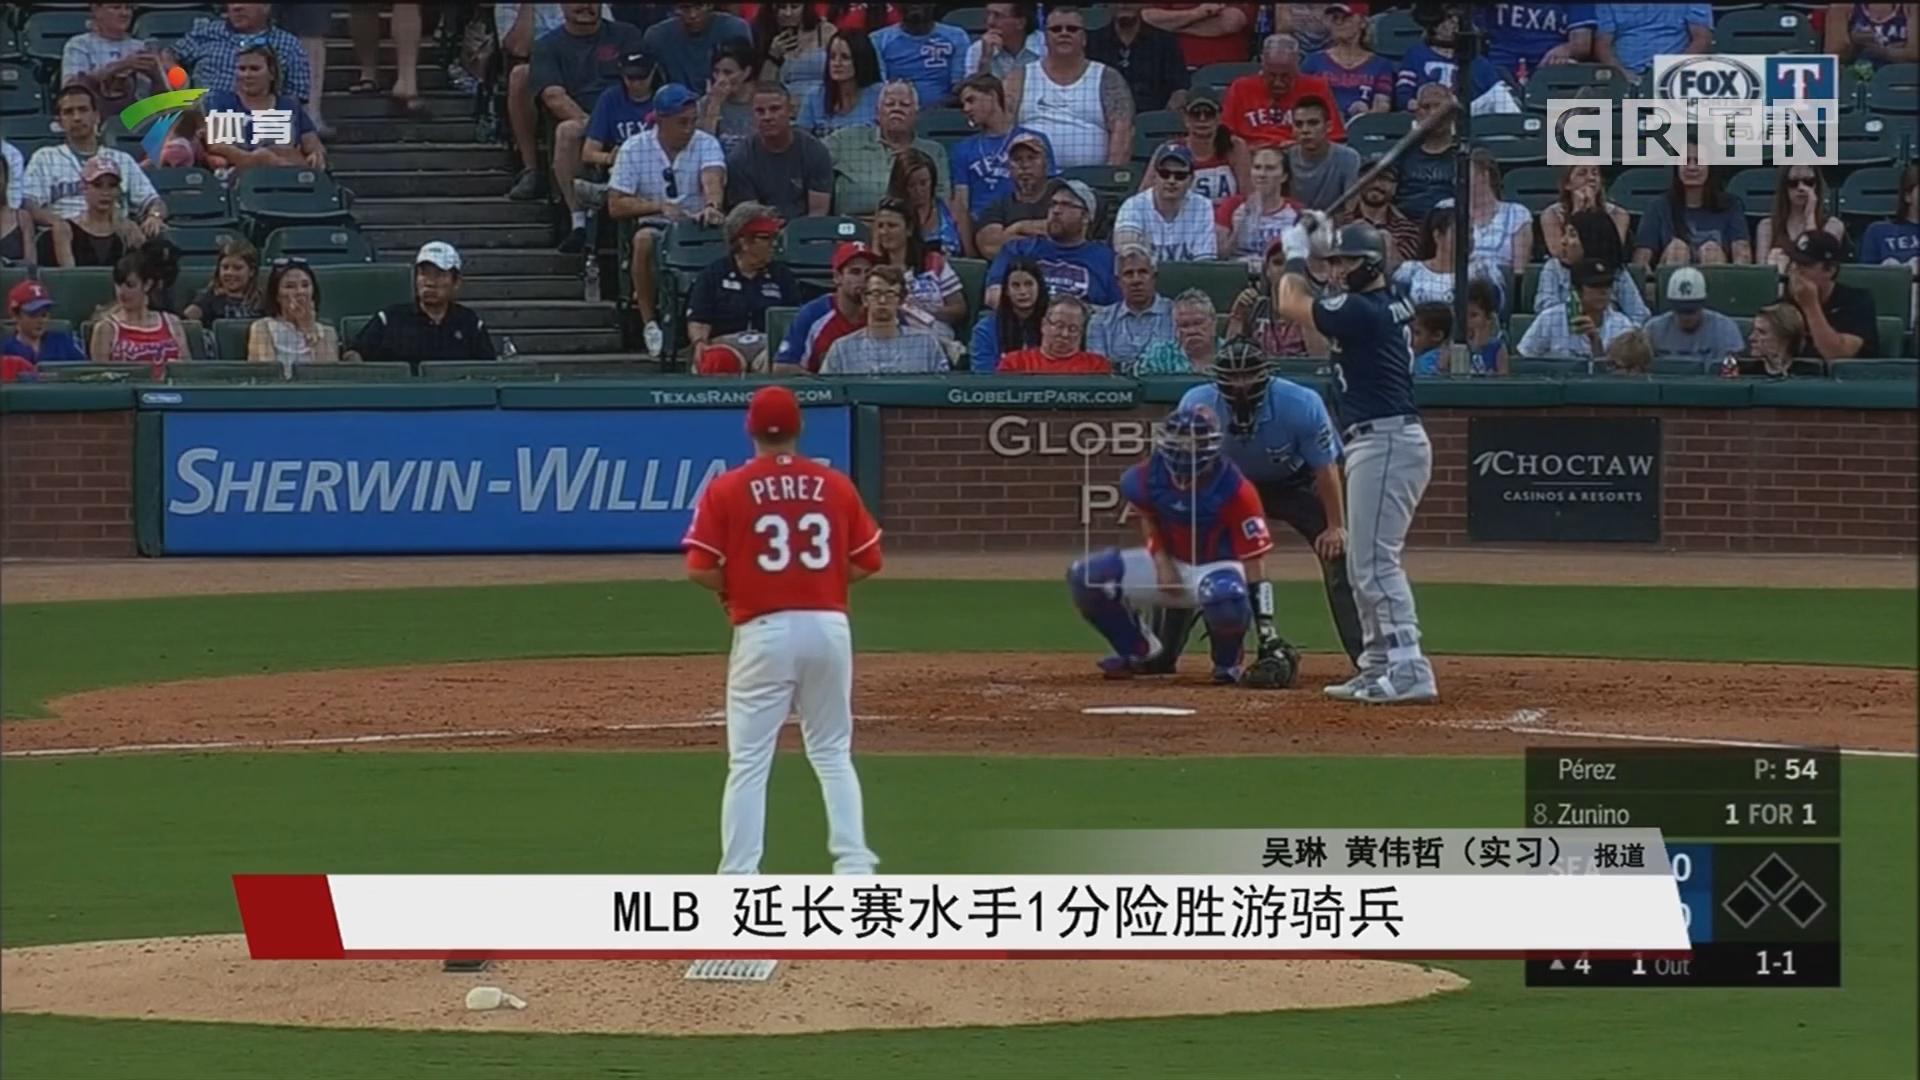 MLB 延长赛水手1分险胜游骑兵